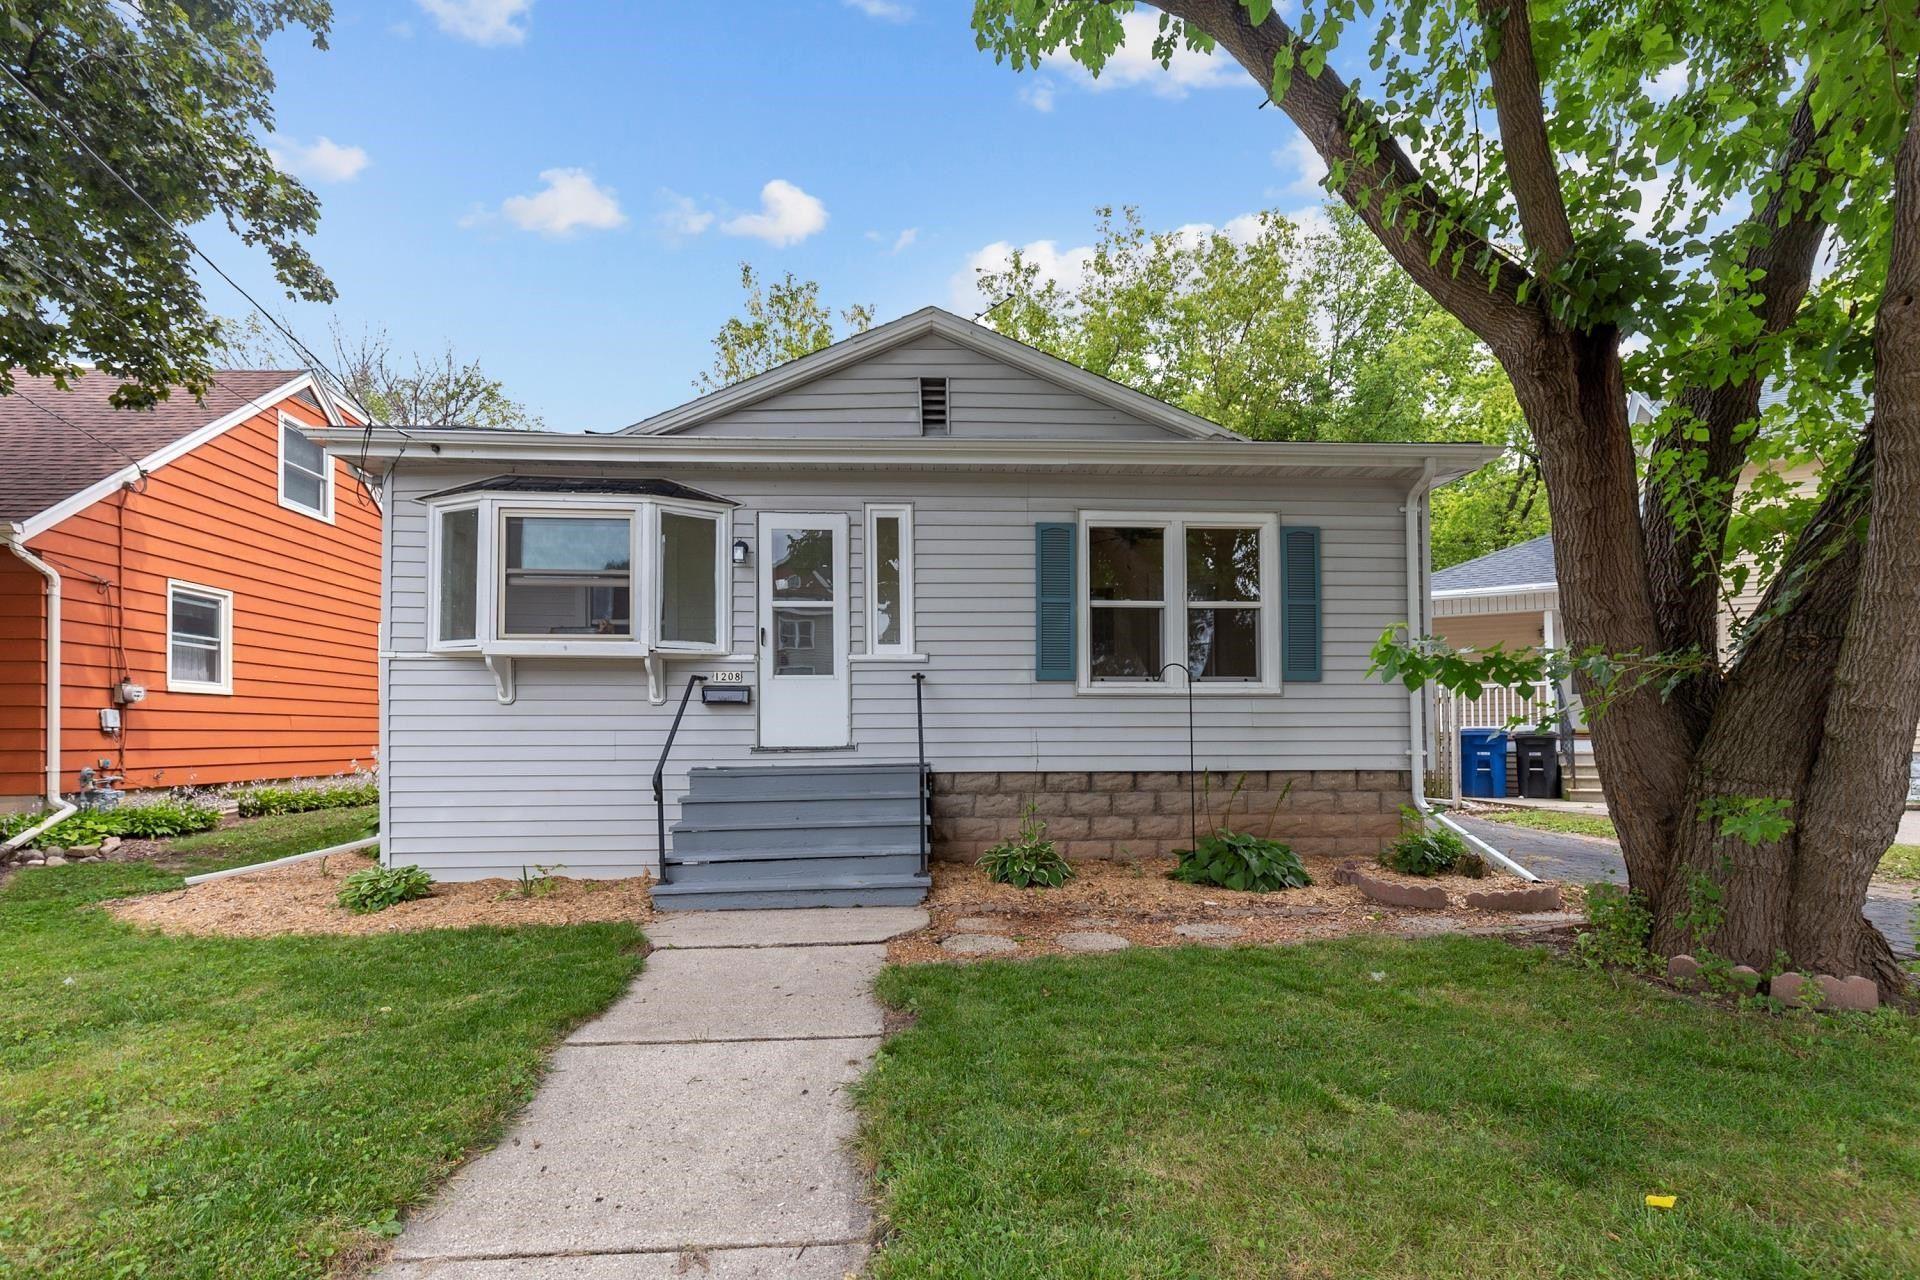 1208 ELMWOOD Avenue, Oshkosh, WI 54901 - MLS#: 50247160